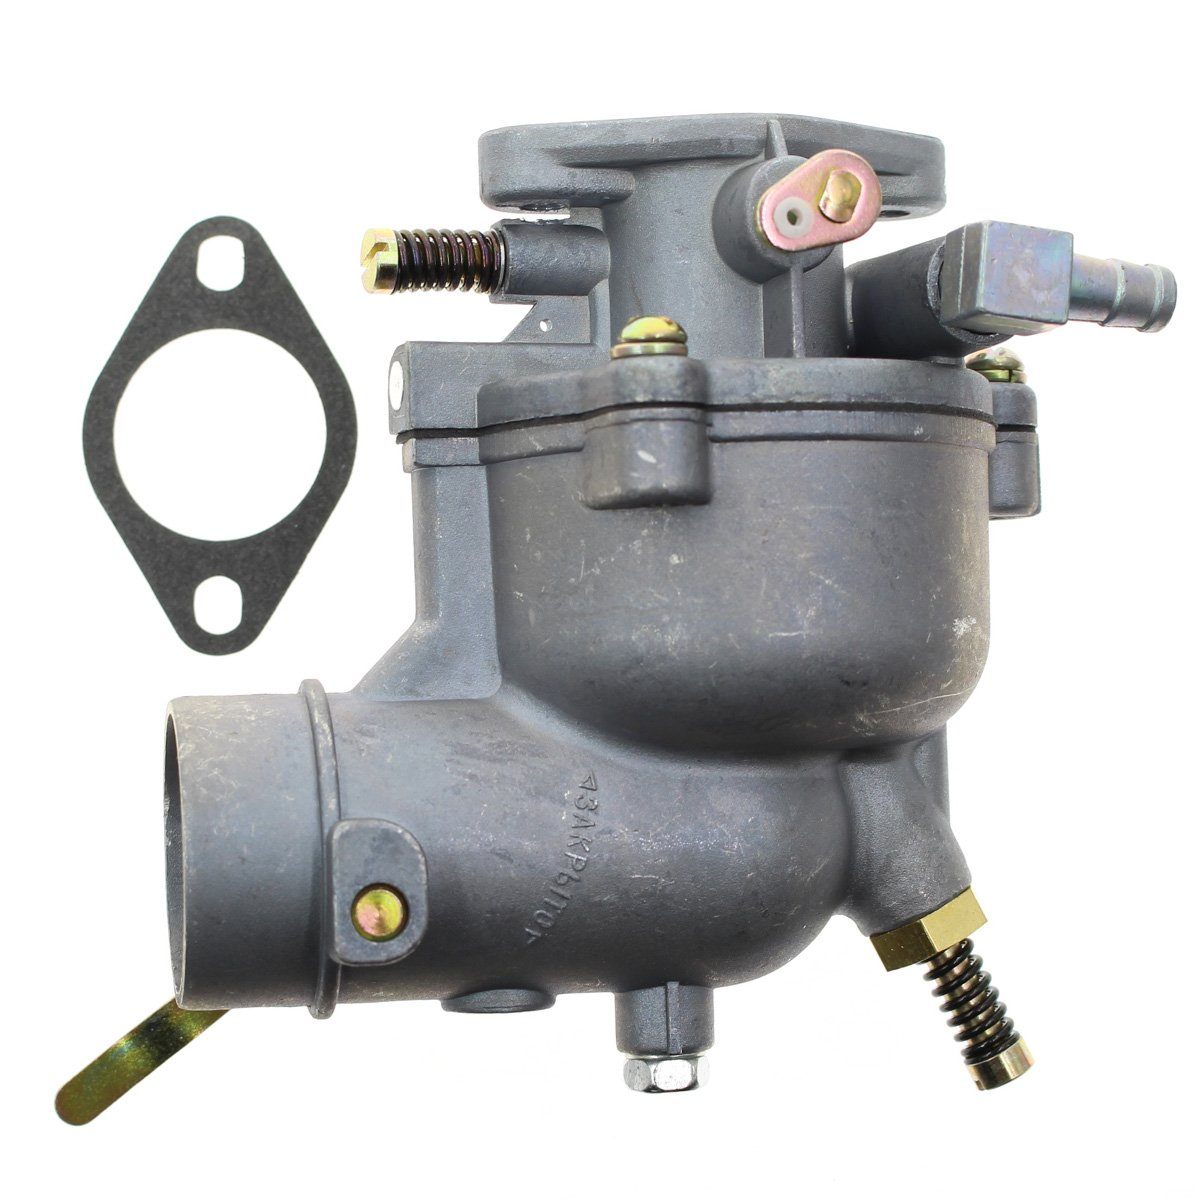 Carbhub Carburetor for Briggs & Stratton 390323 394228 398170 7HP 8HP 9HP Horizontal Engines Troybilt Carb by Carbhub